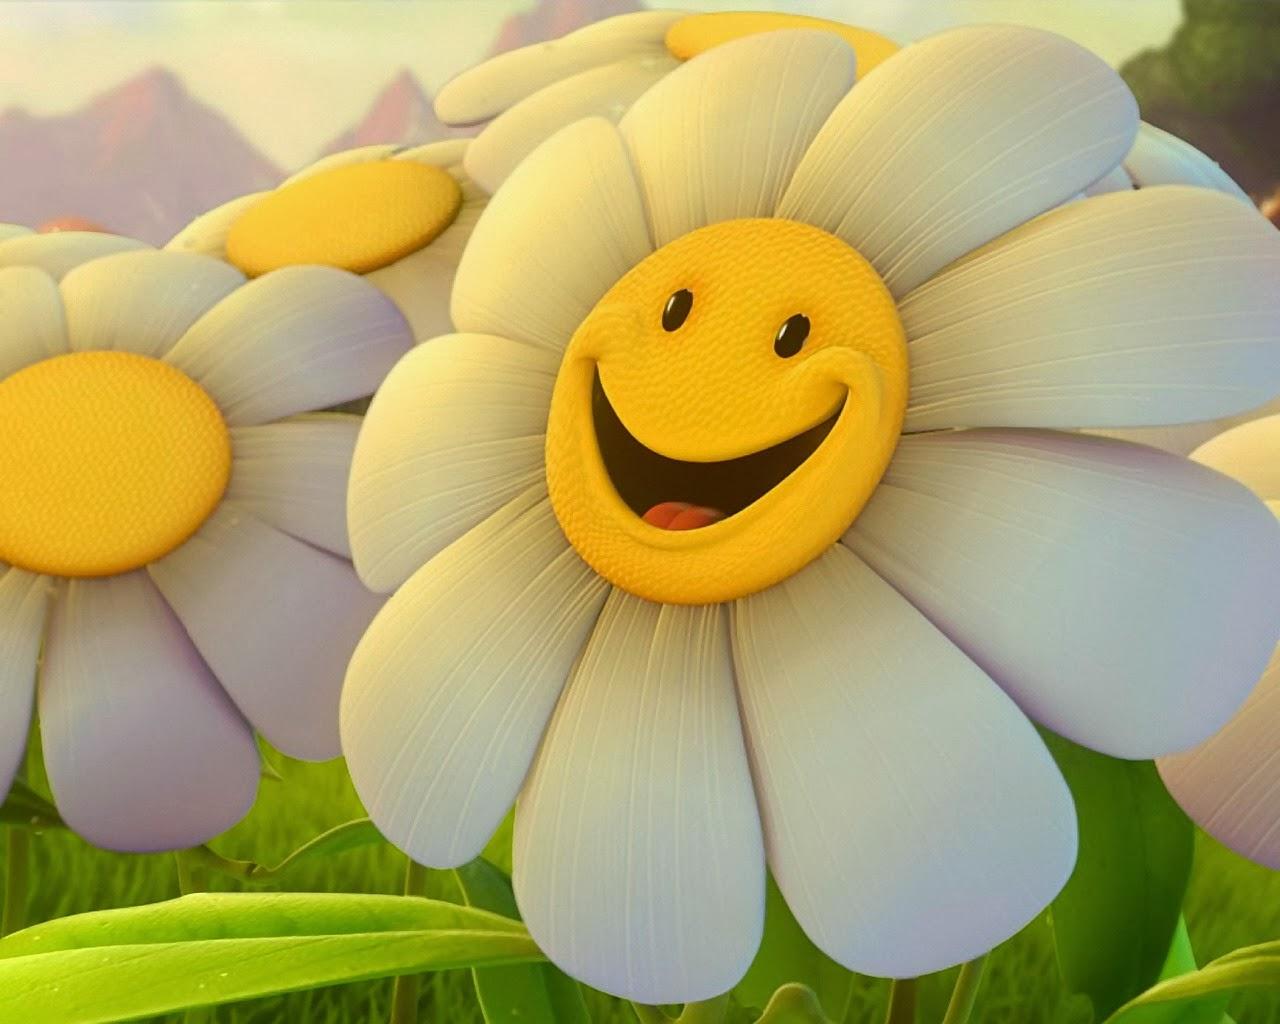 sonreír por sonreír